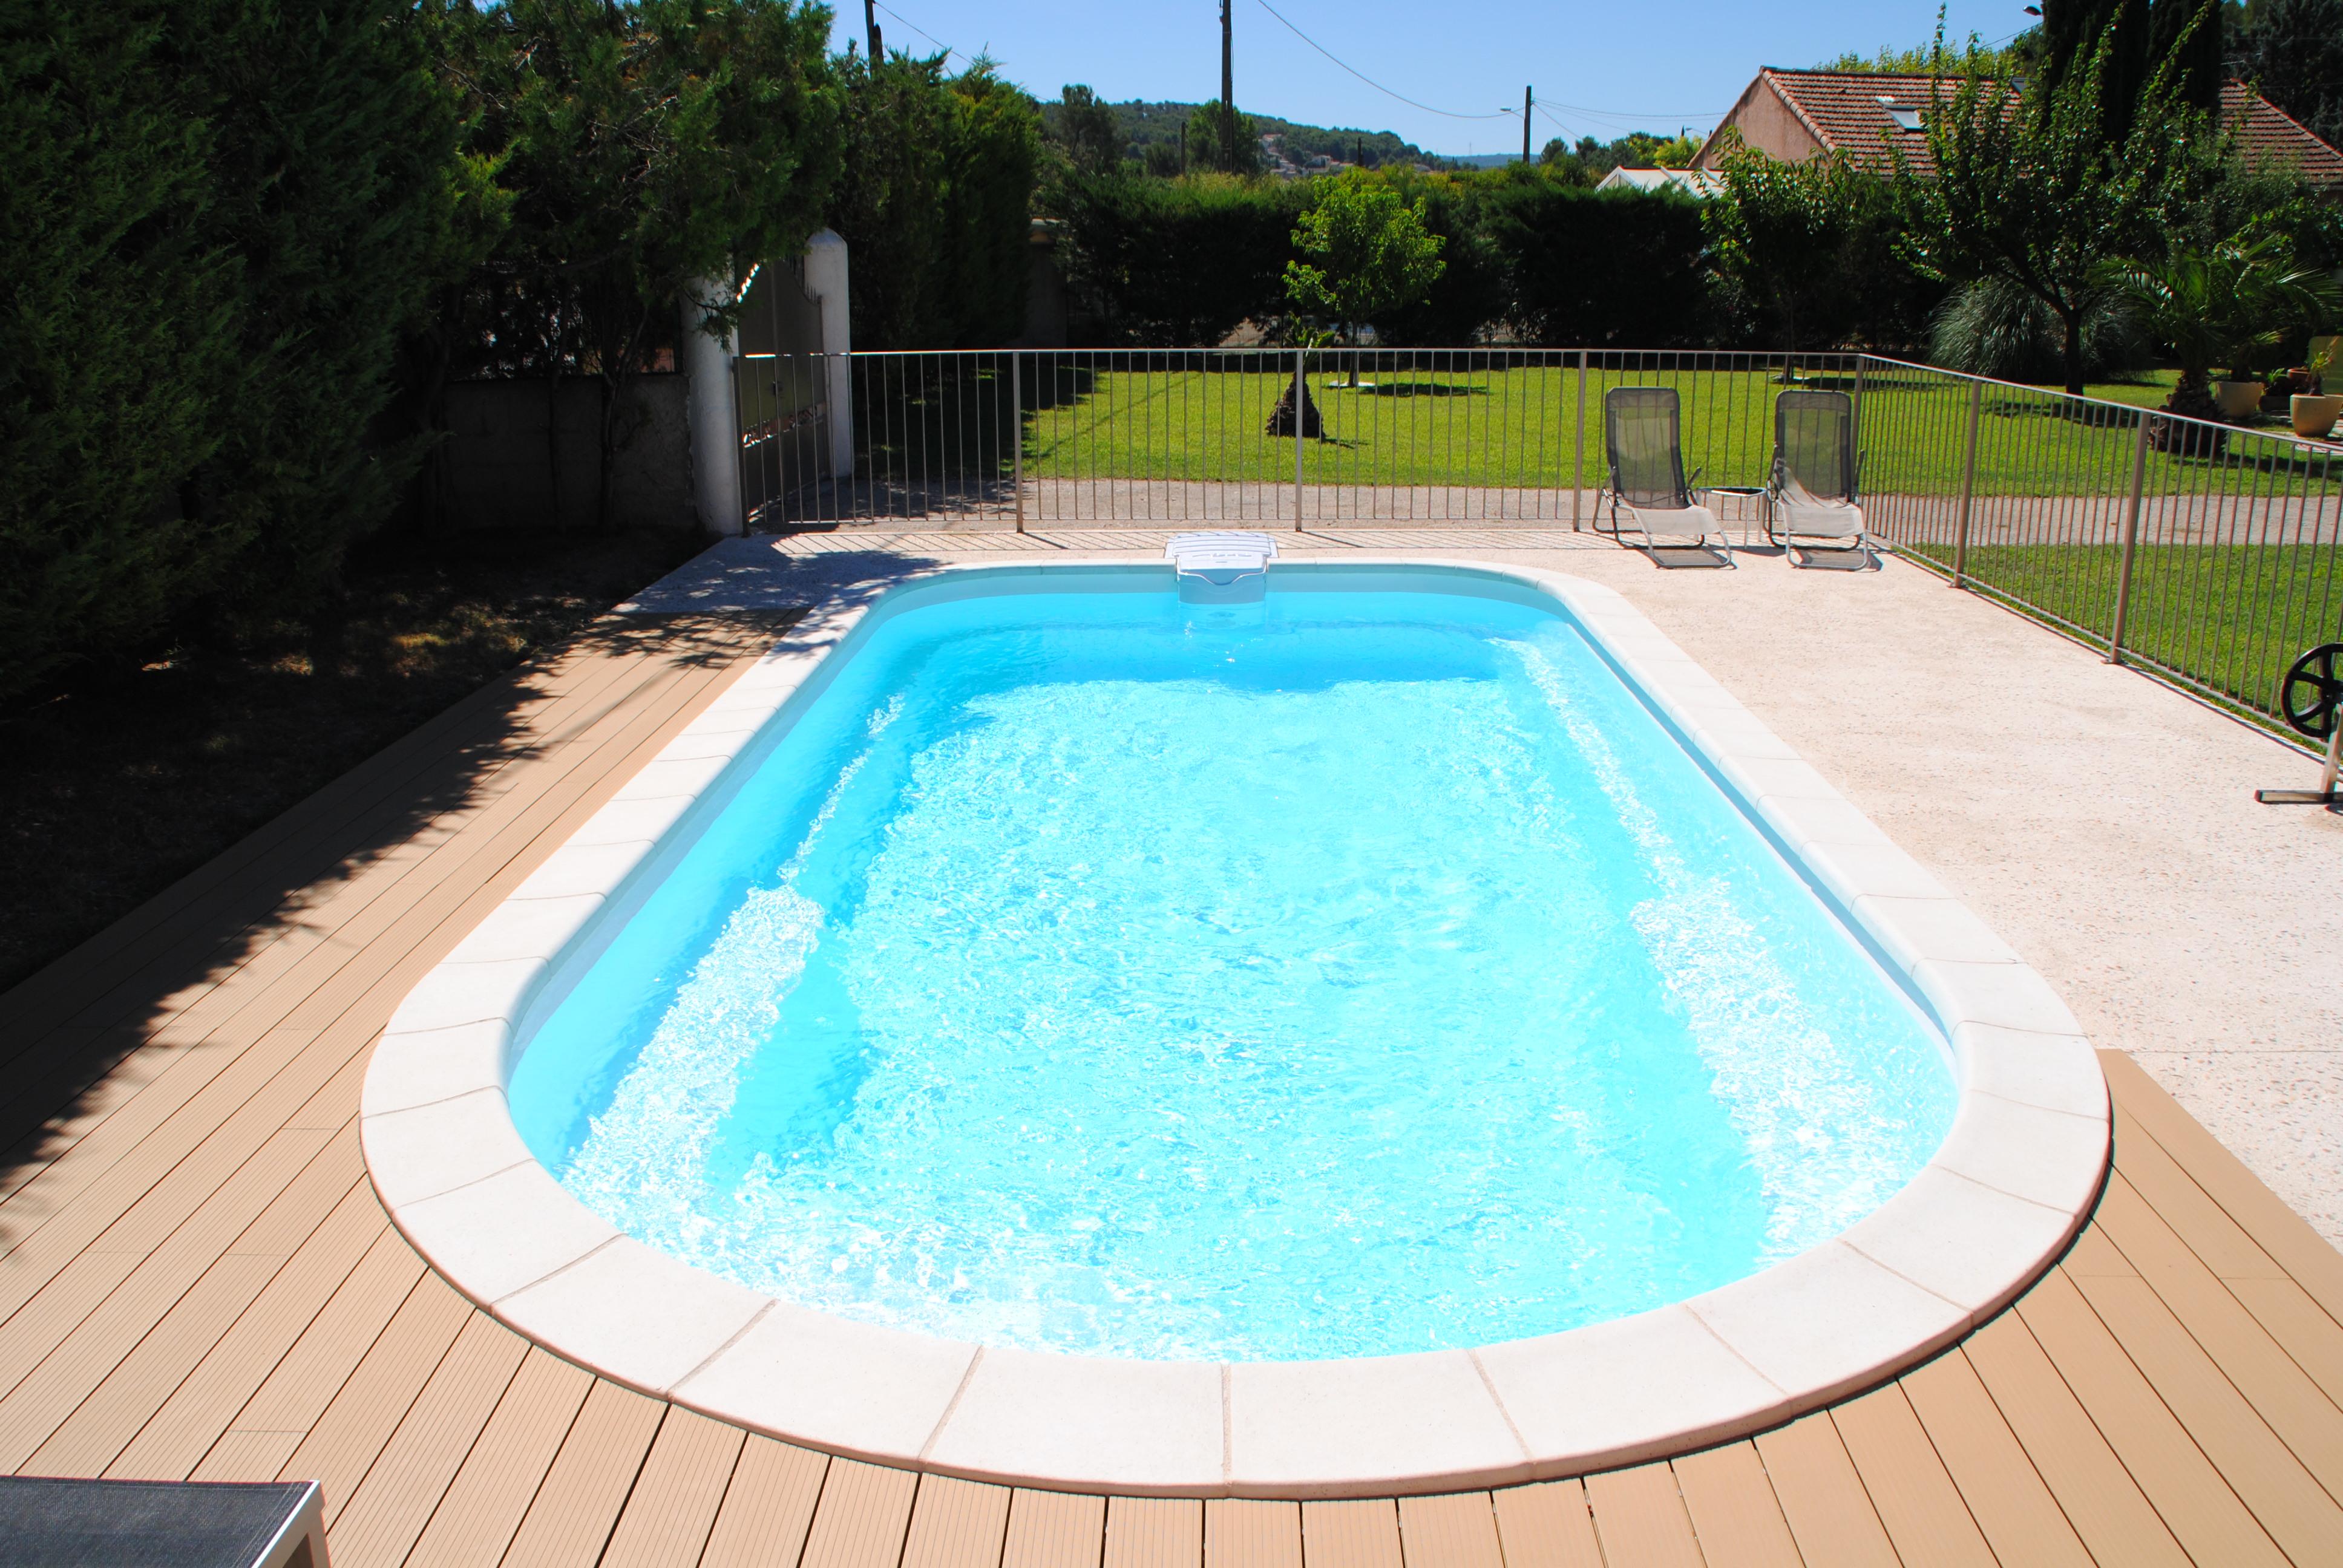 Coque polyester axeo 800 avec bloc filtrant nos piscines for Piscine monocoque polyester